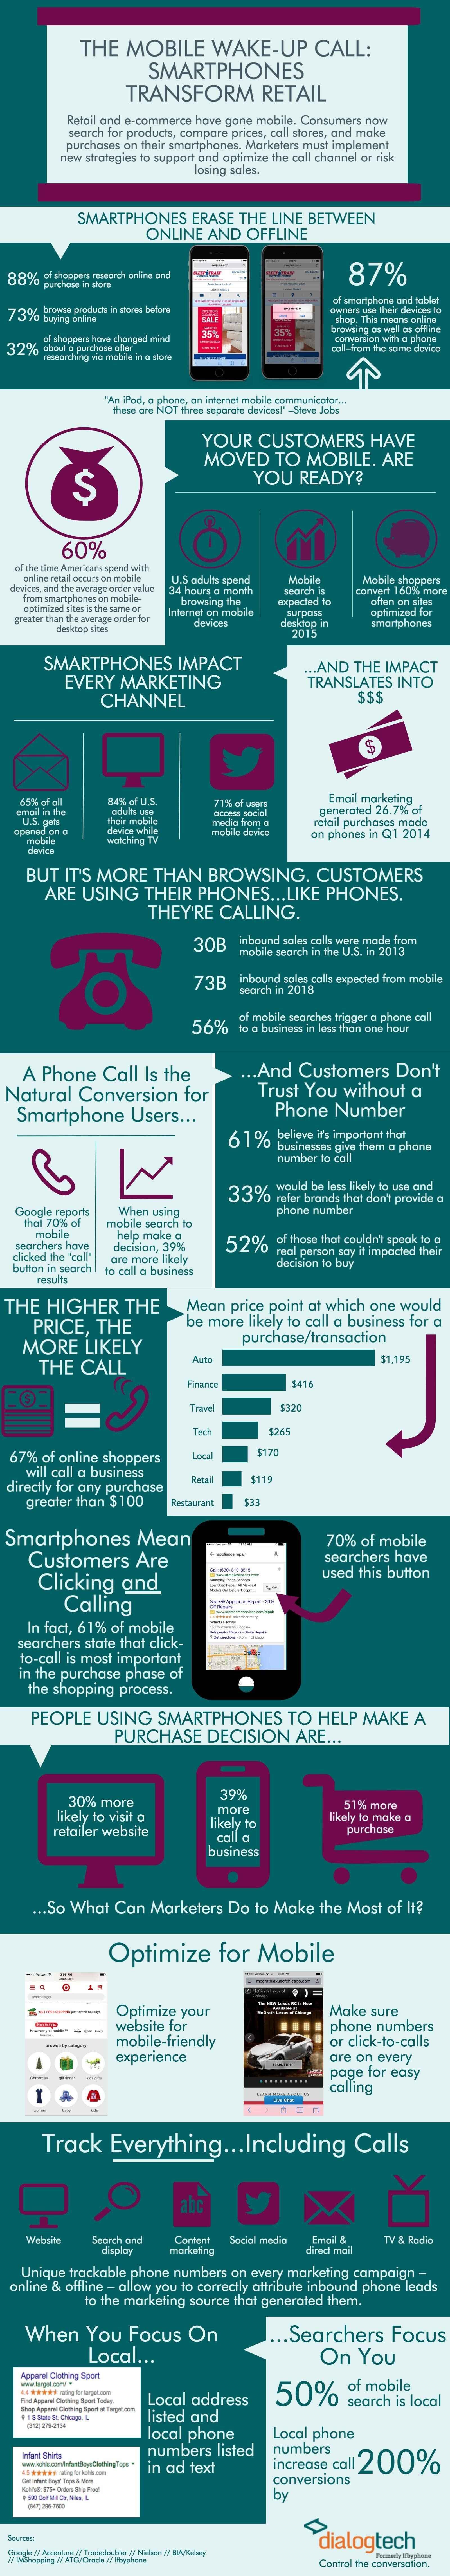 mobile retail dialogtech infographic